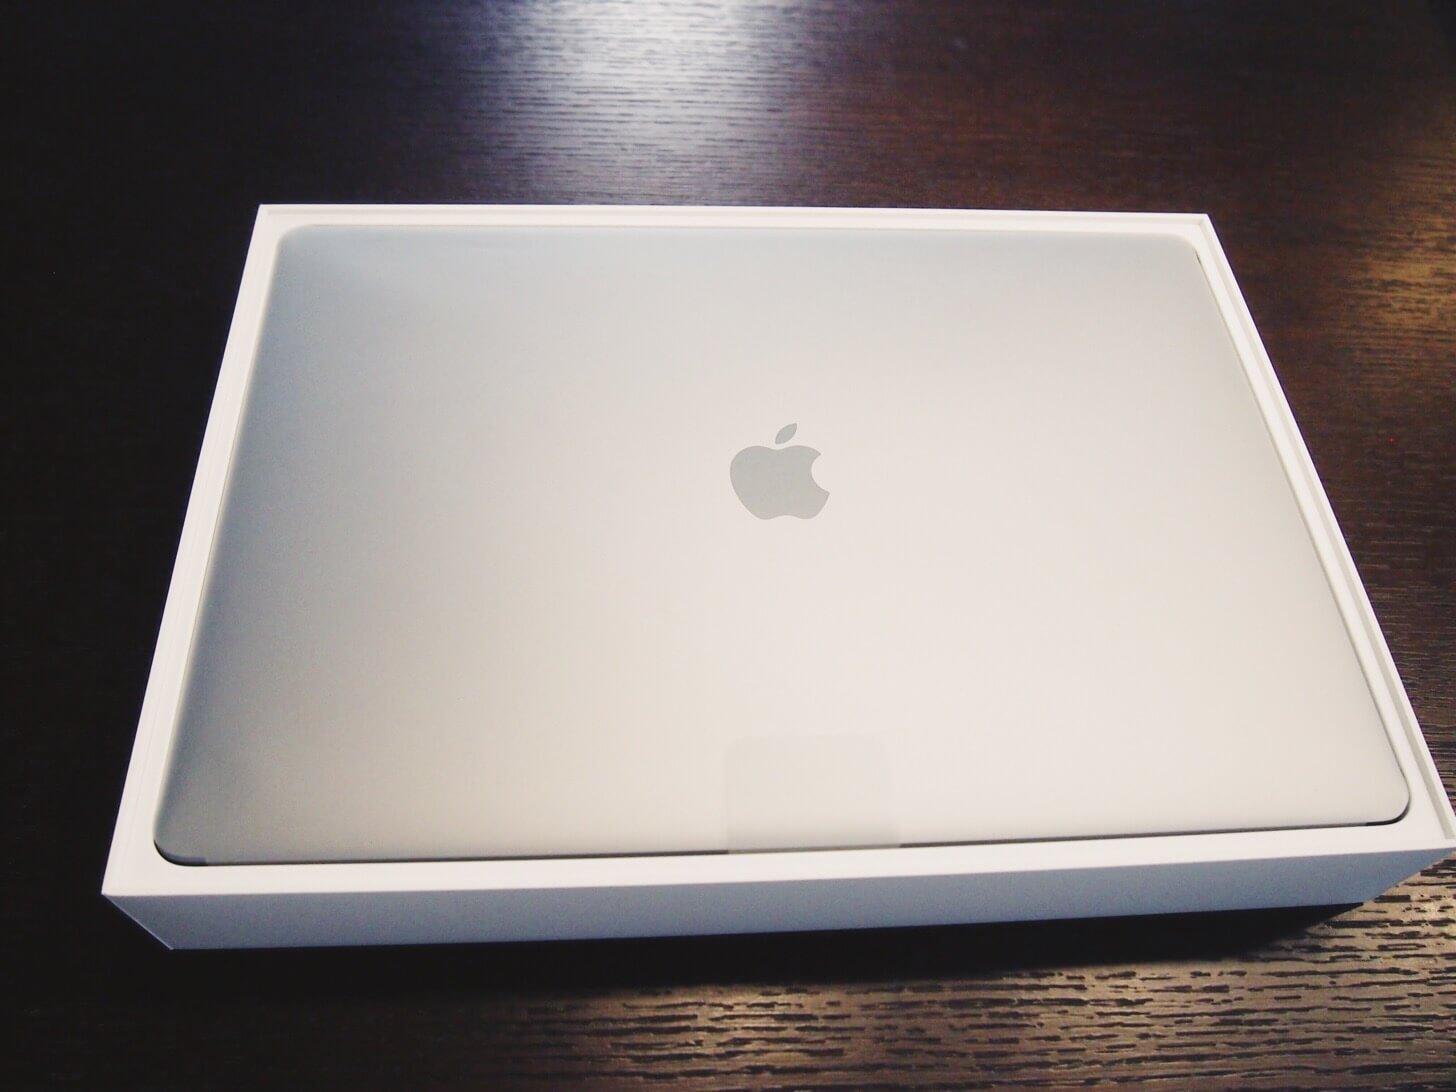 macbookpro2016-15inch-6